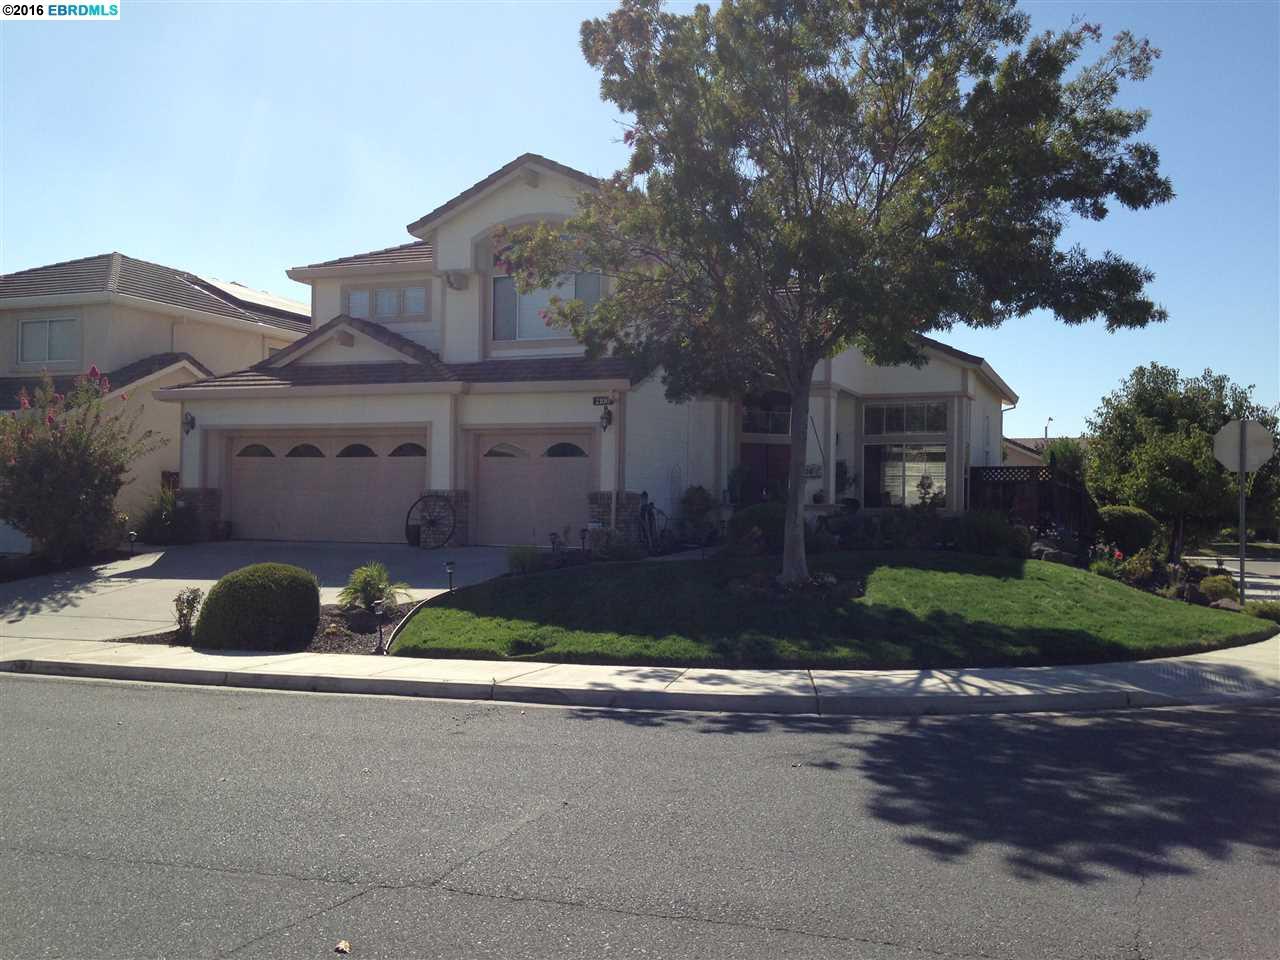 2100 Spruce Way, Antioch, CA 94509